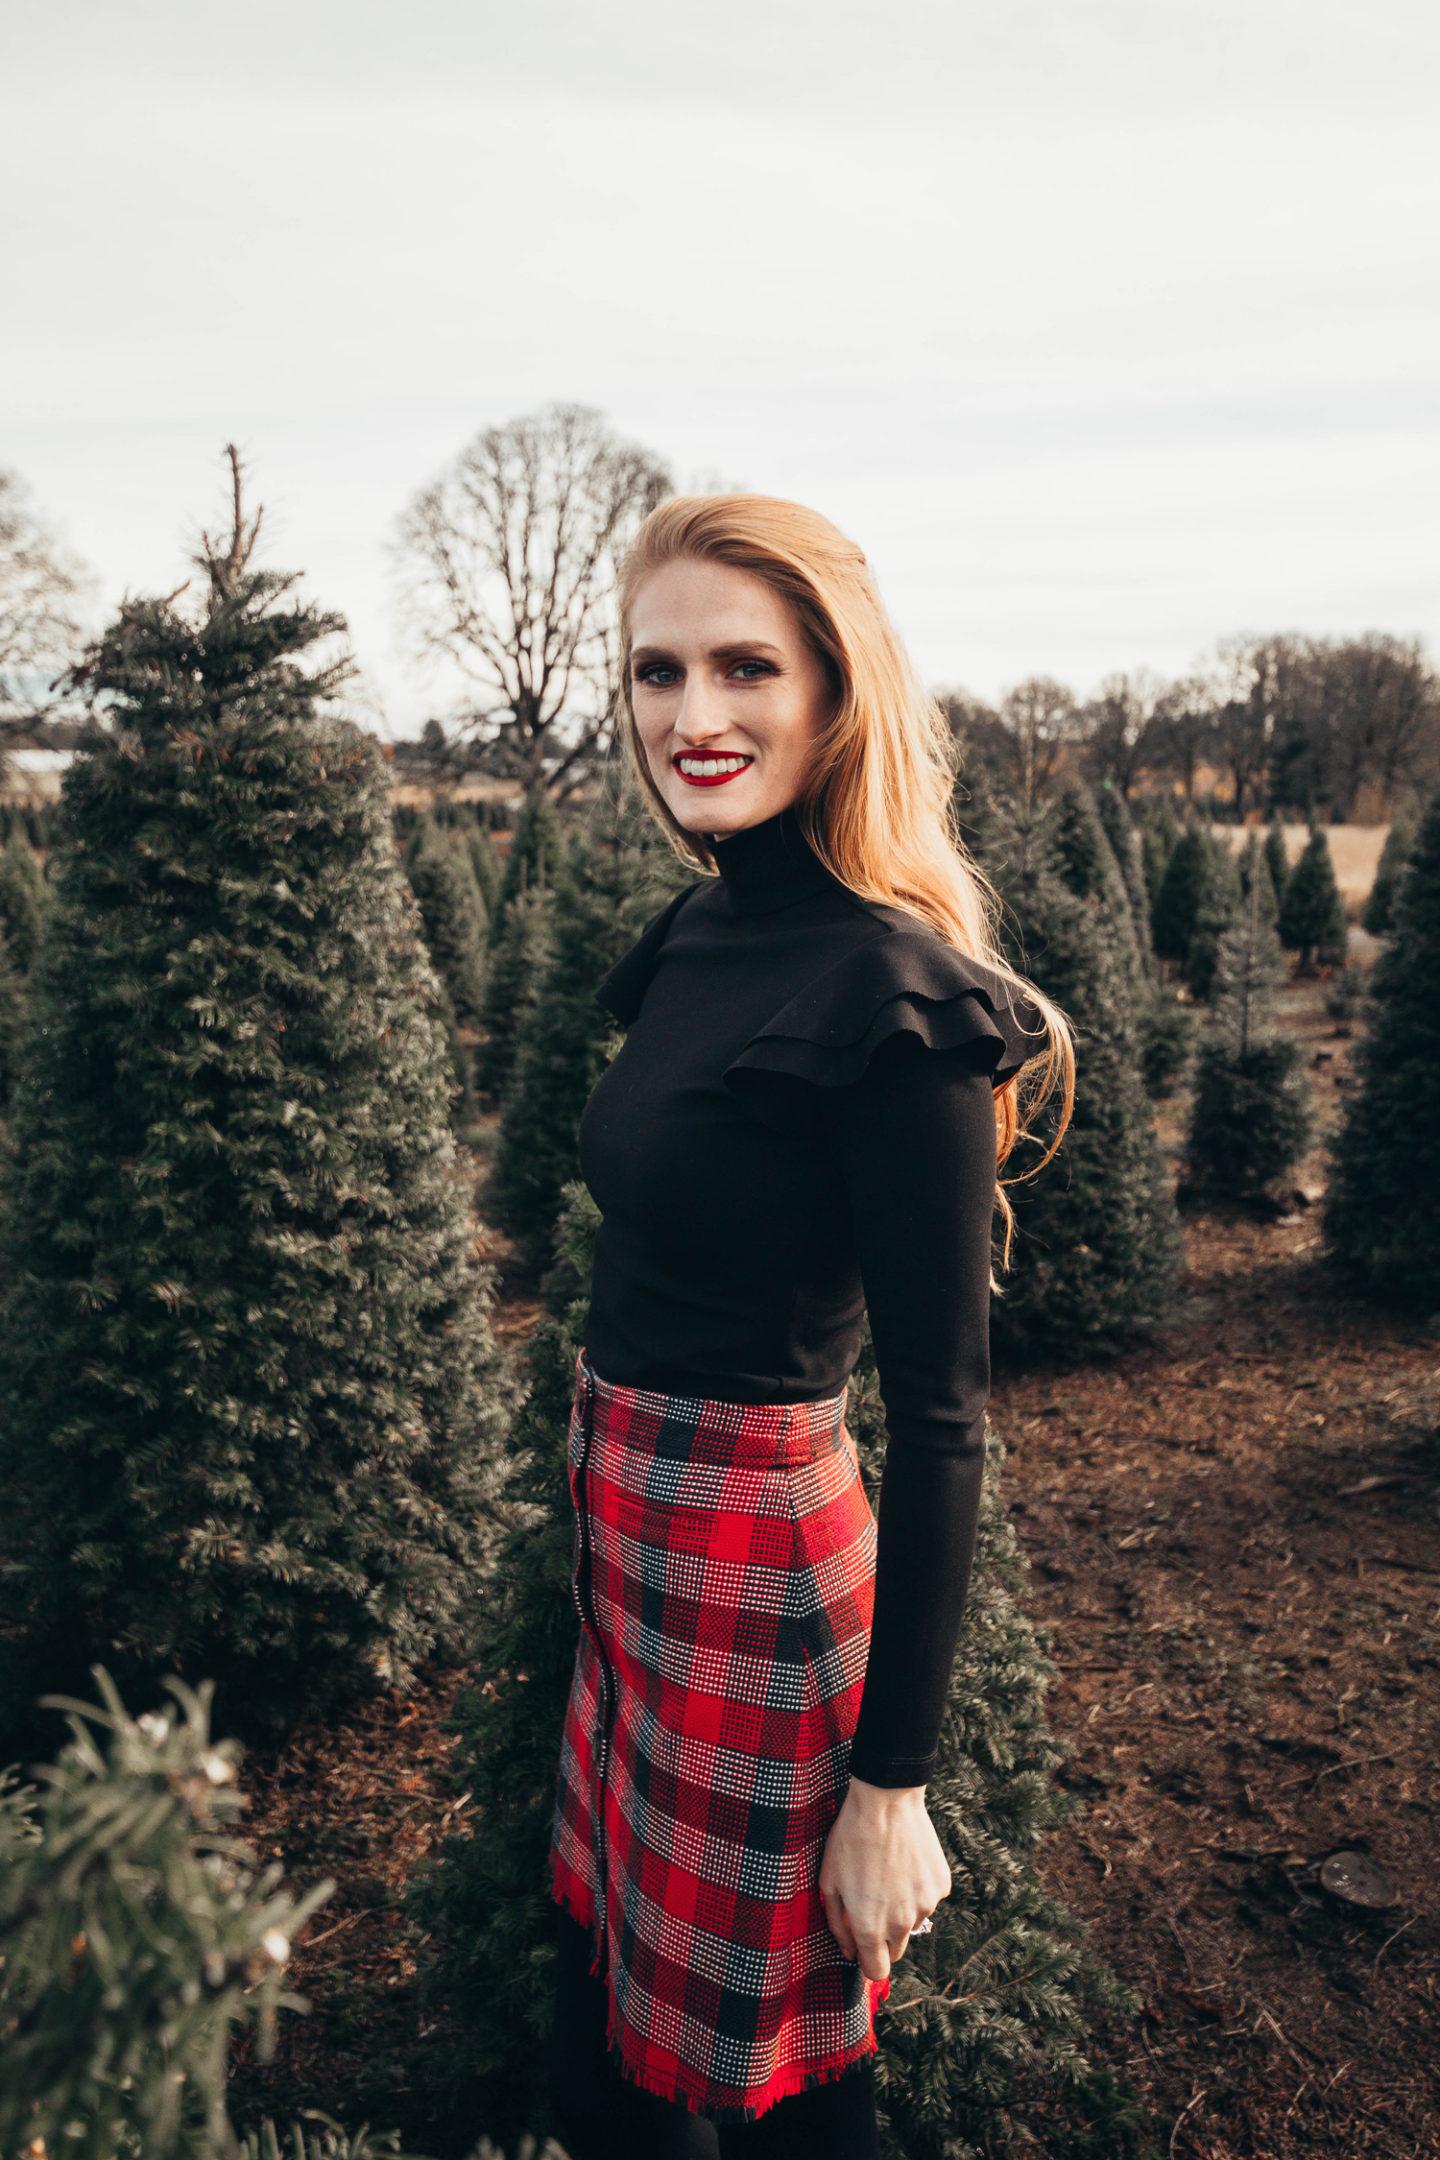 Rocking Around The Christmas Tree: Plaid Mini Skirt Winter Style Outfit Idea